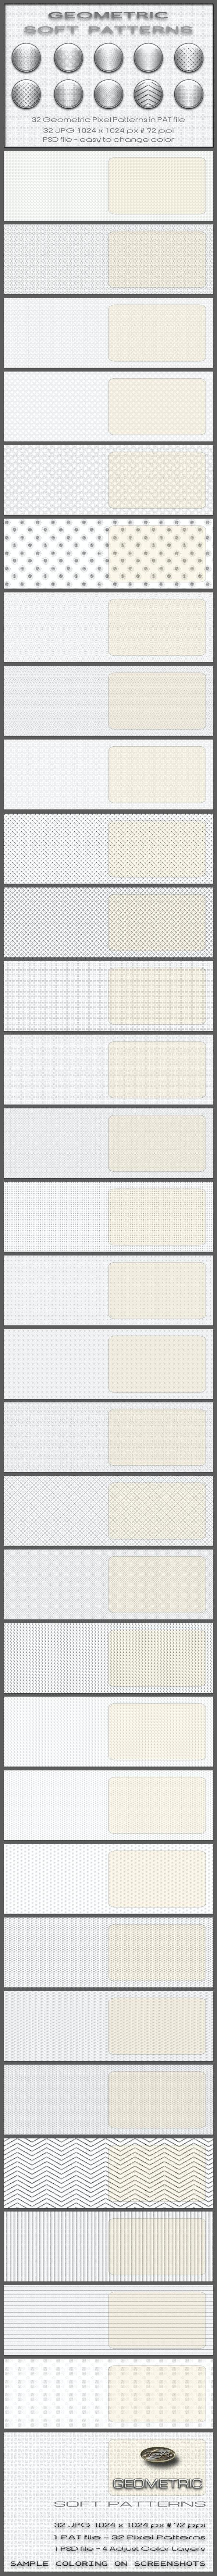 32 Geometric Soft Patterns - Textures / Fills / Patterns Photoshop